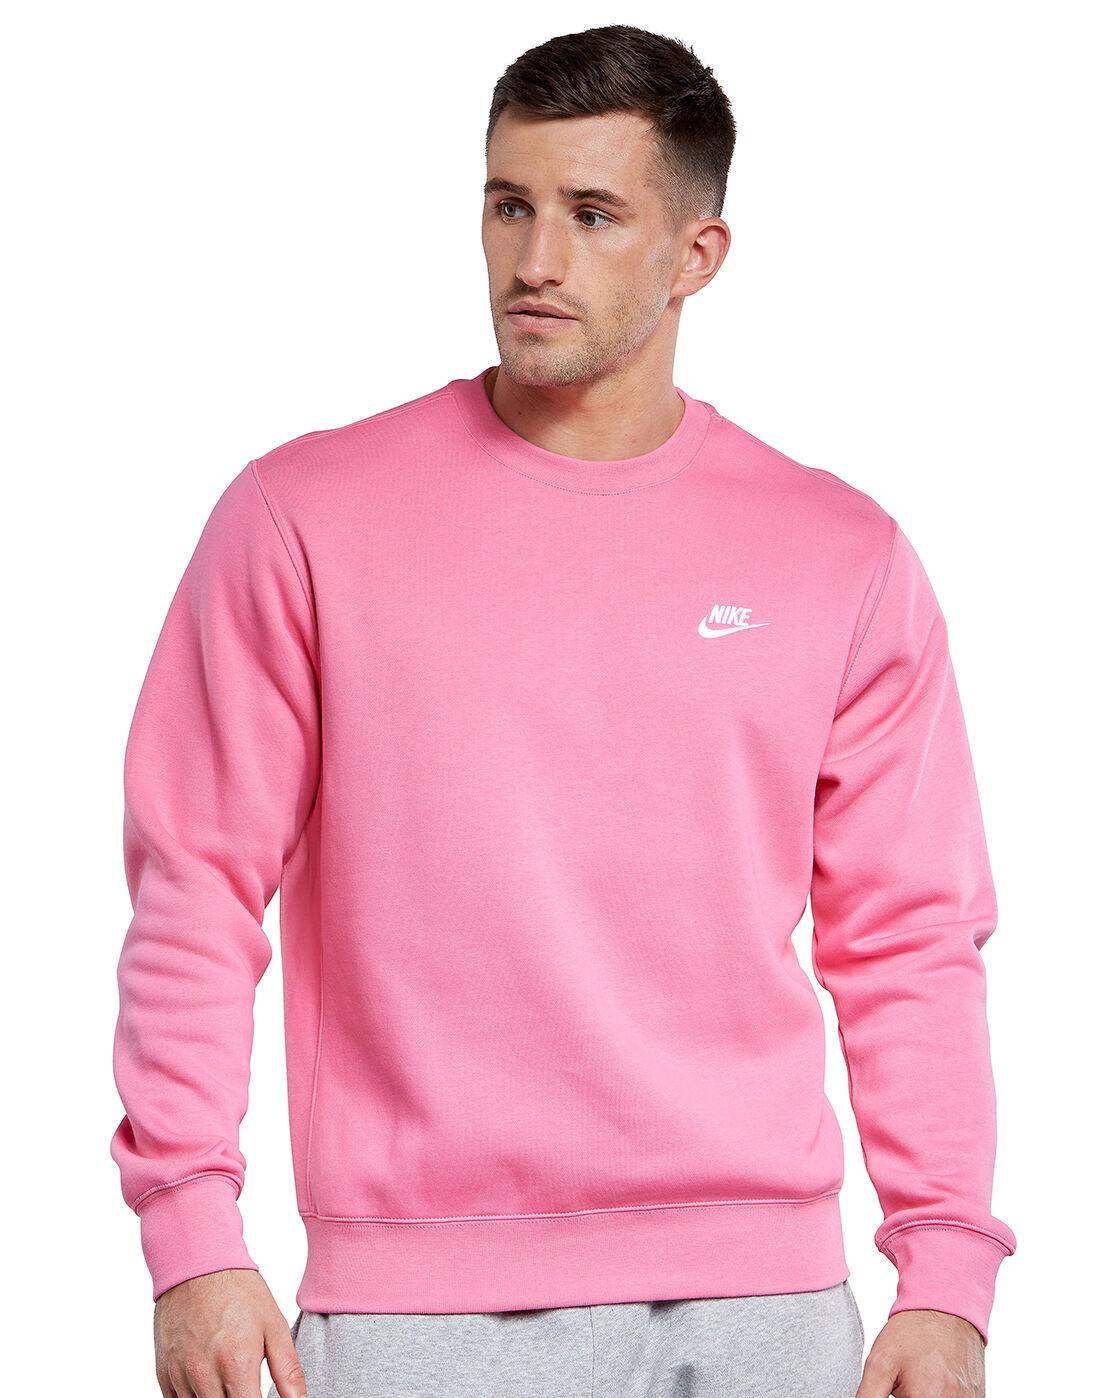 Nike Mens Club Crew Neck Sweatshirt - Pink | Life Style ...